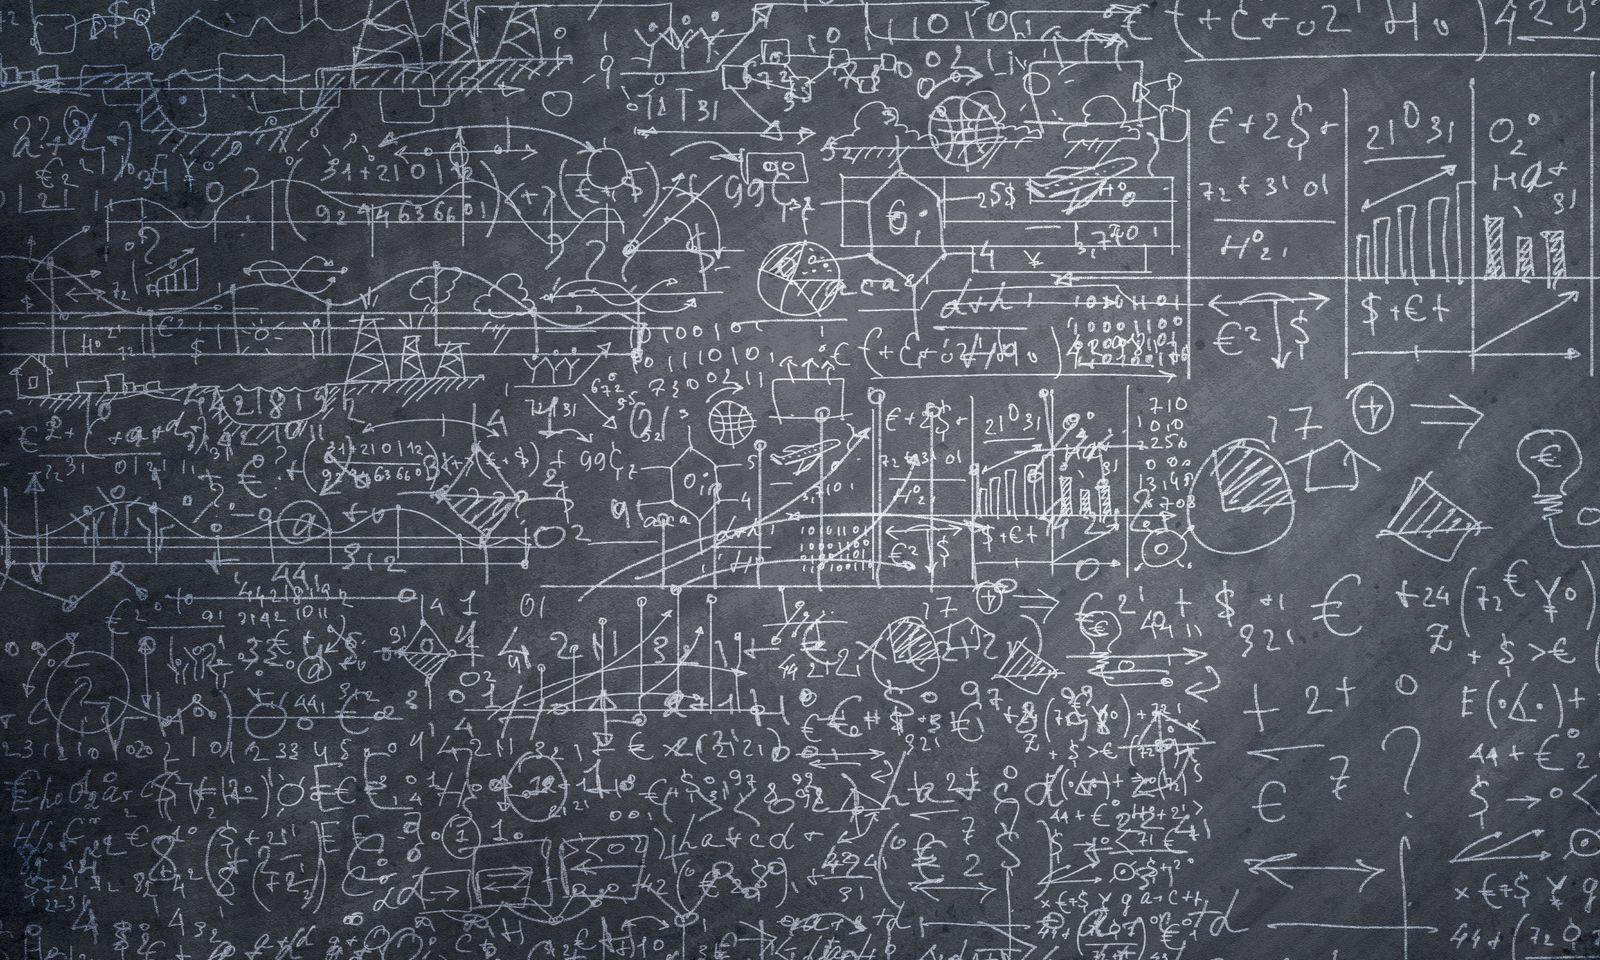 skizze,kreidetafel,tafelbild *** sketch,blackboard,blackboard vd0-l8c